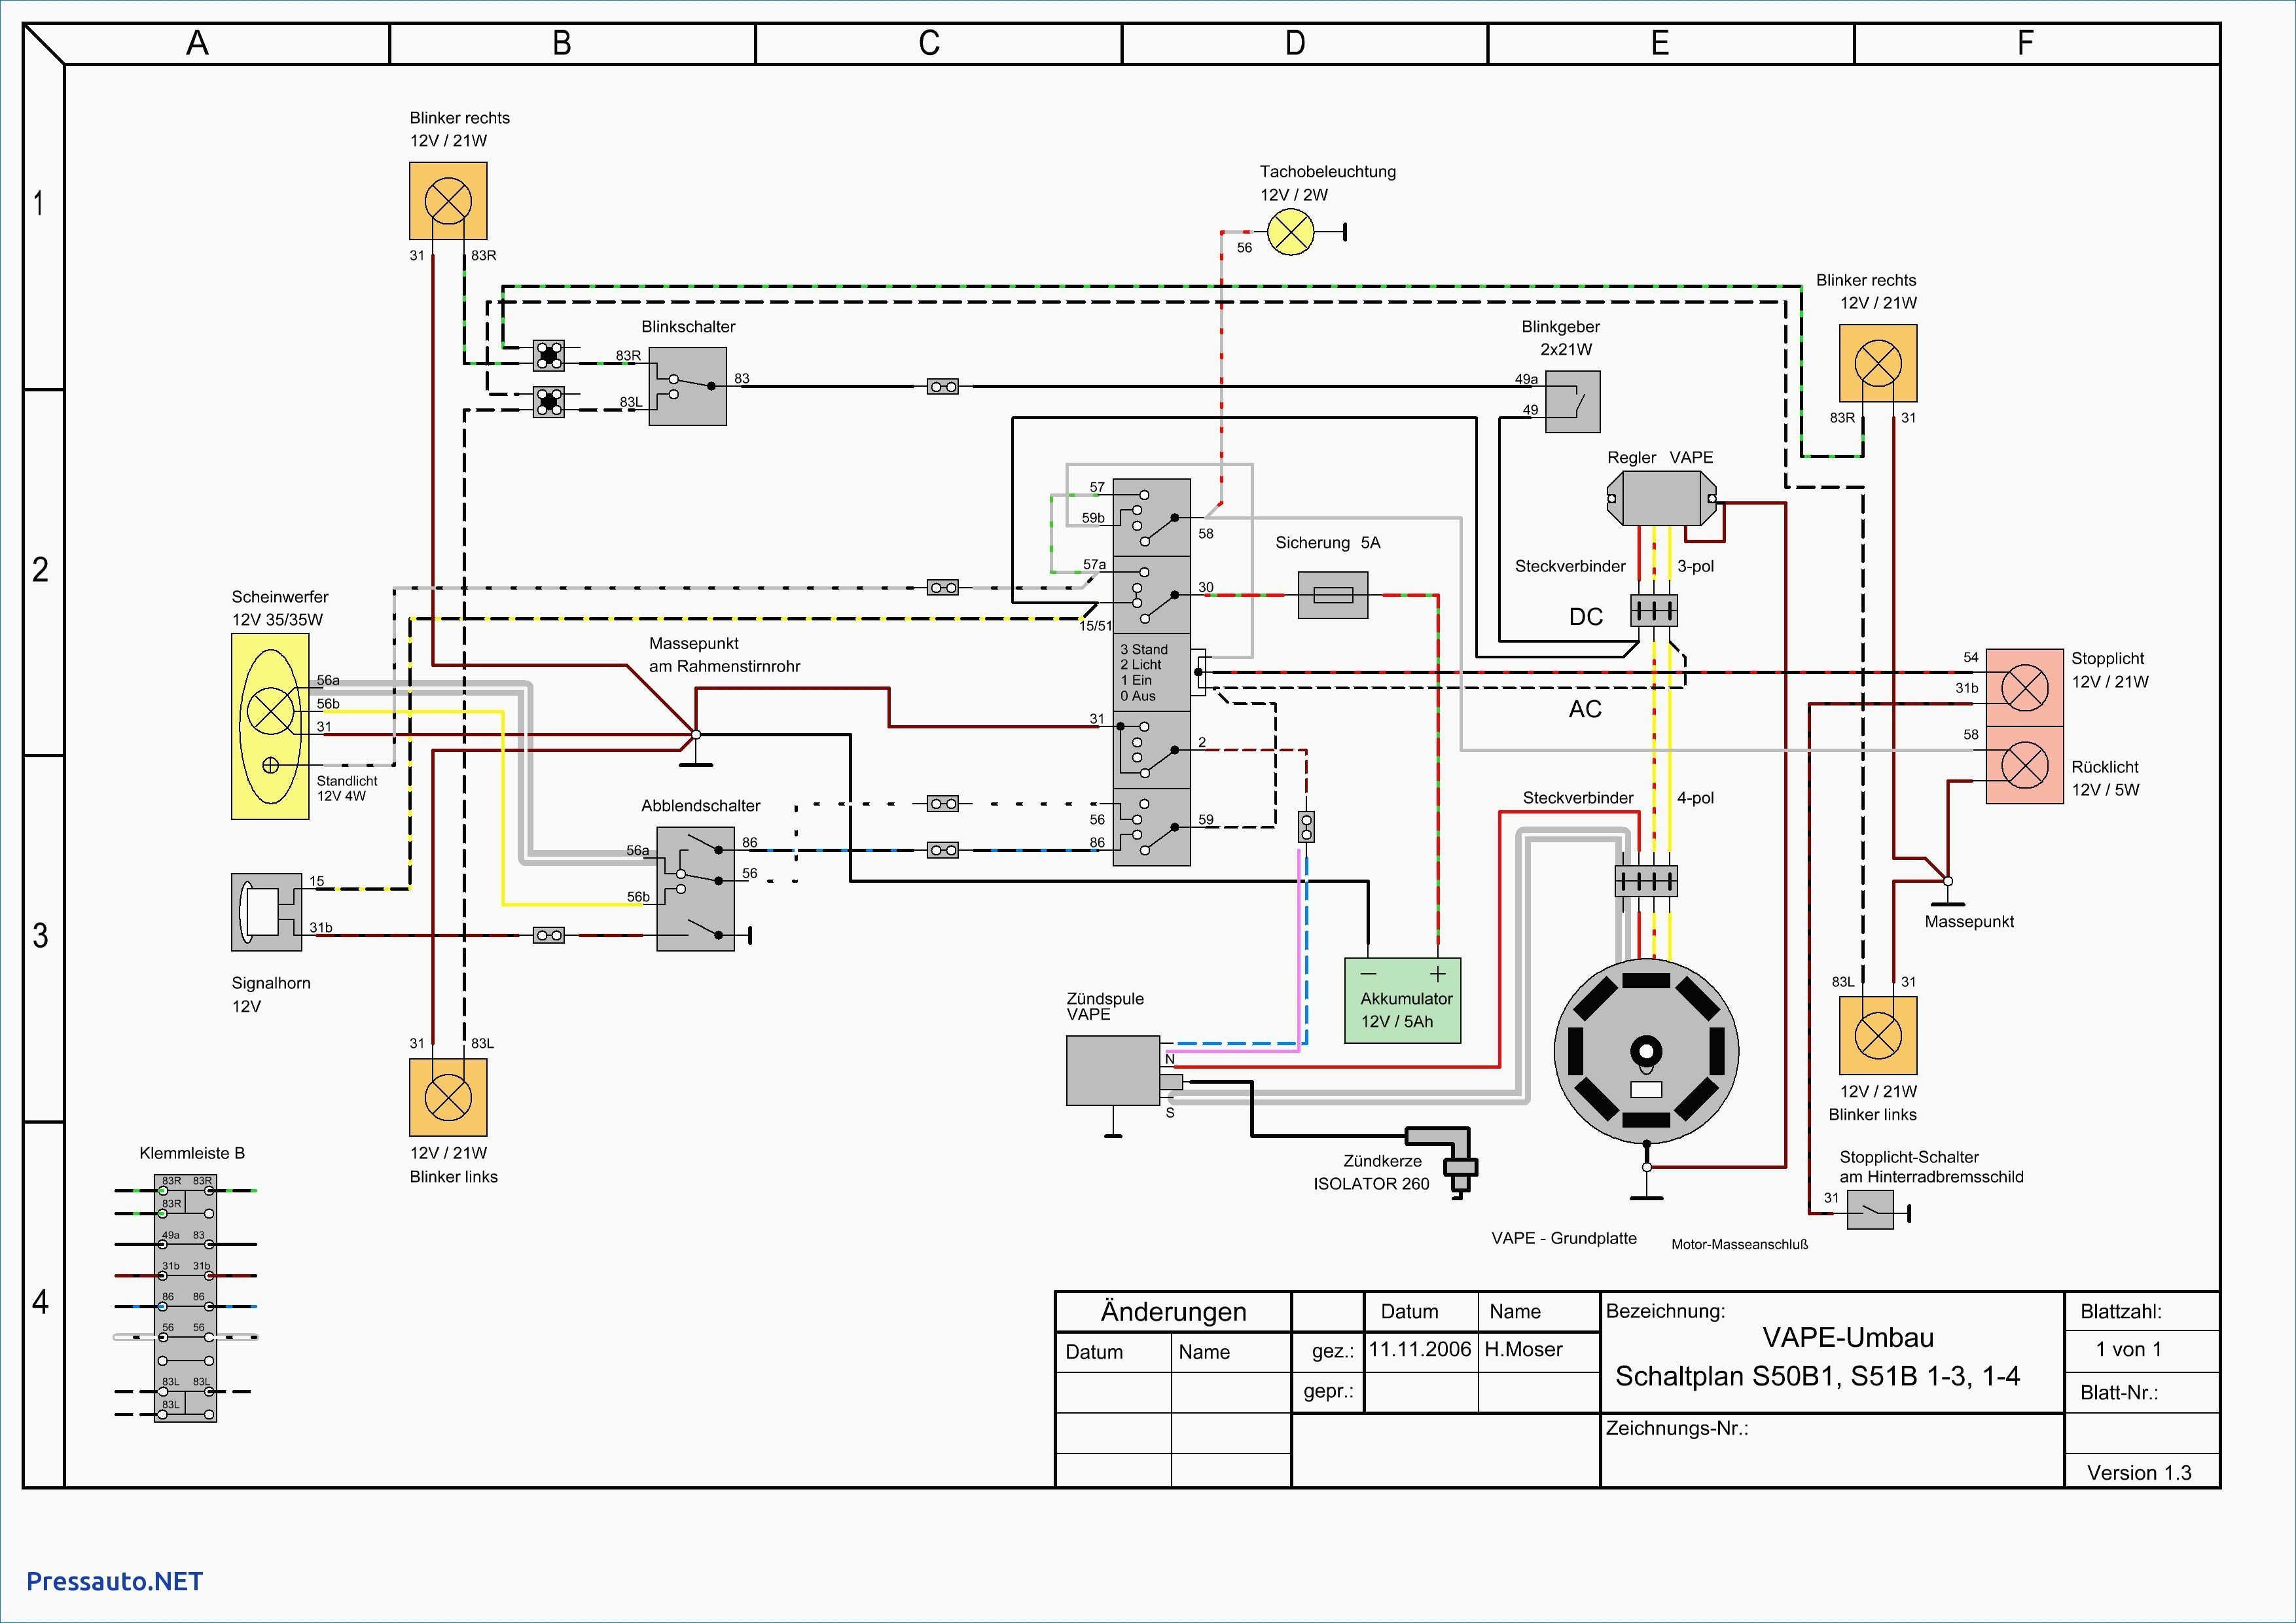 loncin 200cc atv wiring diagram vw 4105  atv wiring diagram on wiring diagram for 110cc 4 wheeler  vw 4105  atv wiring diagram on wiring